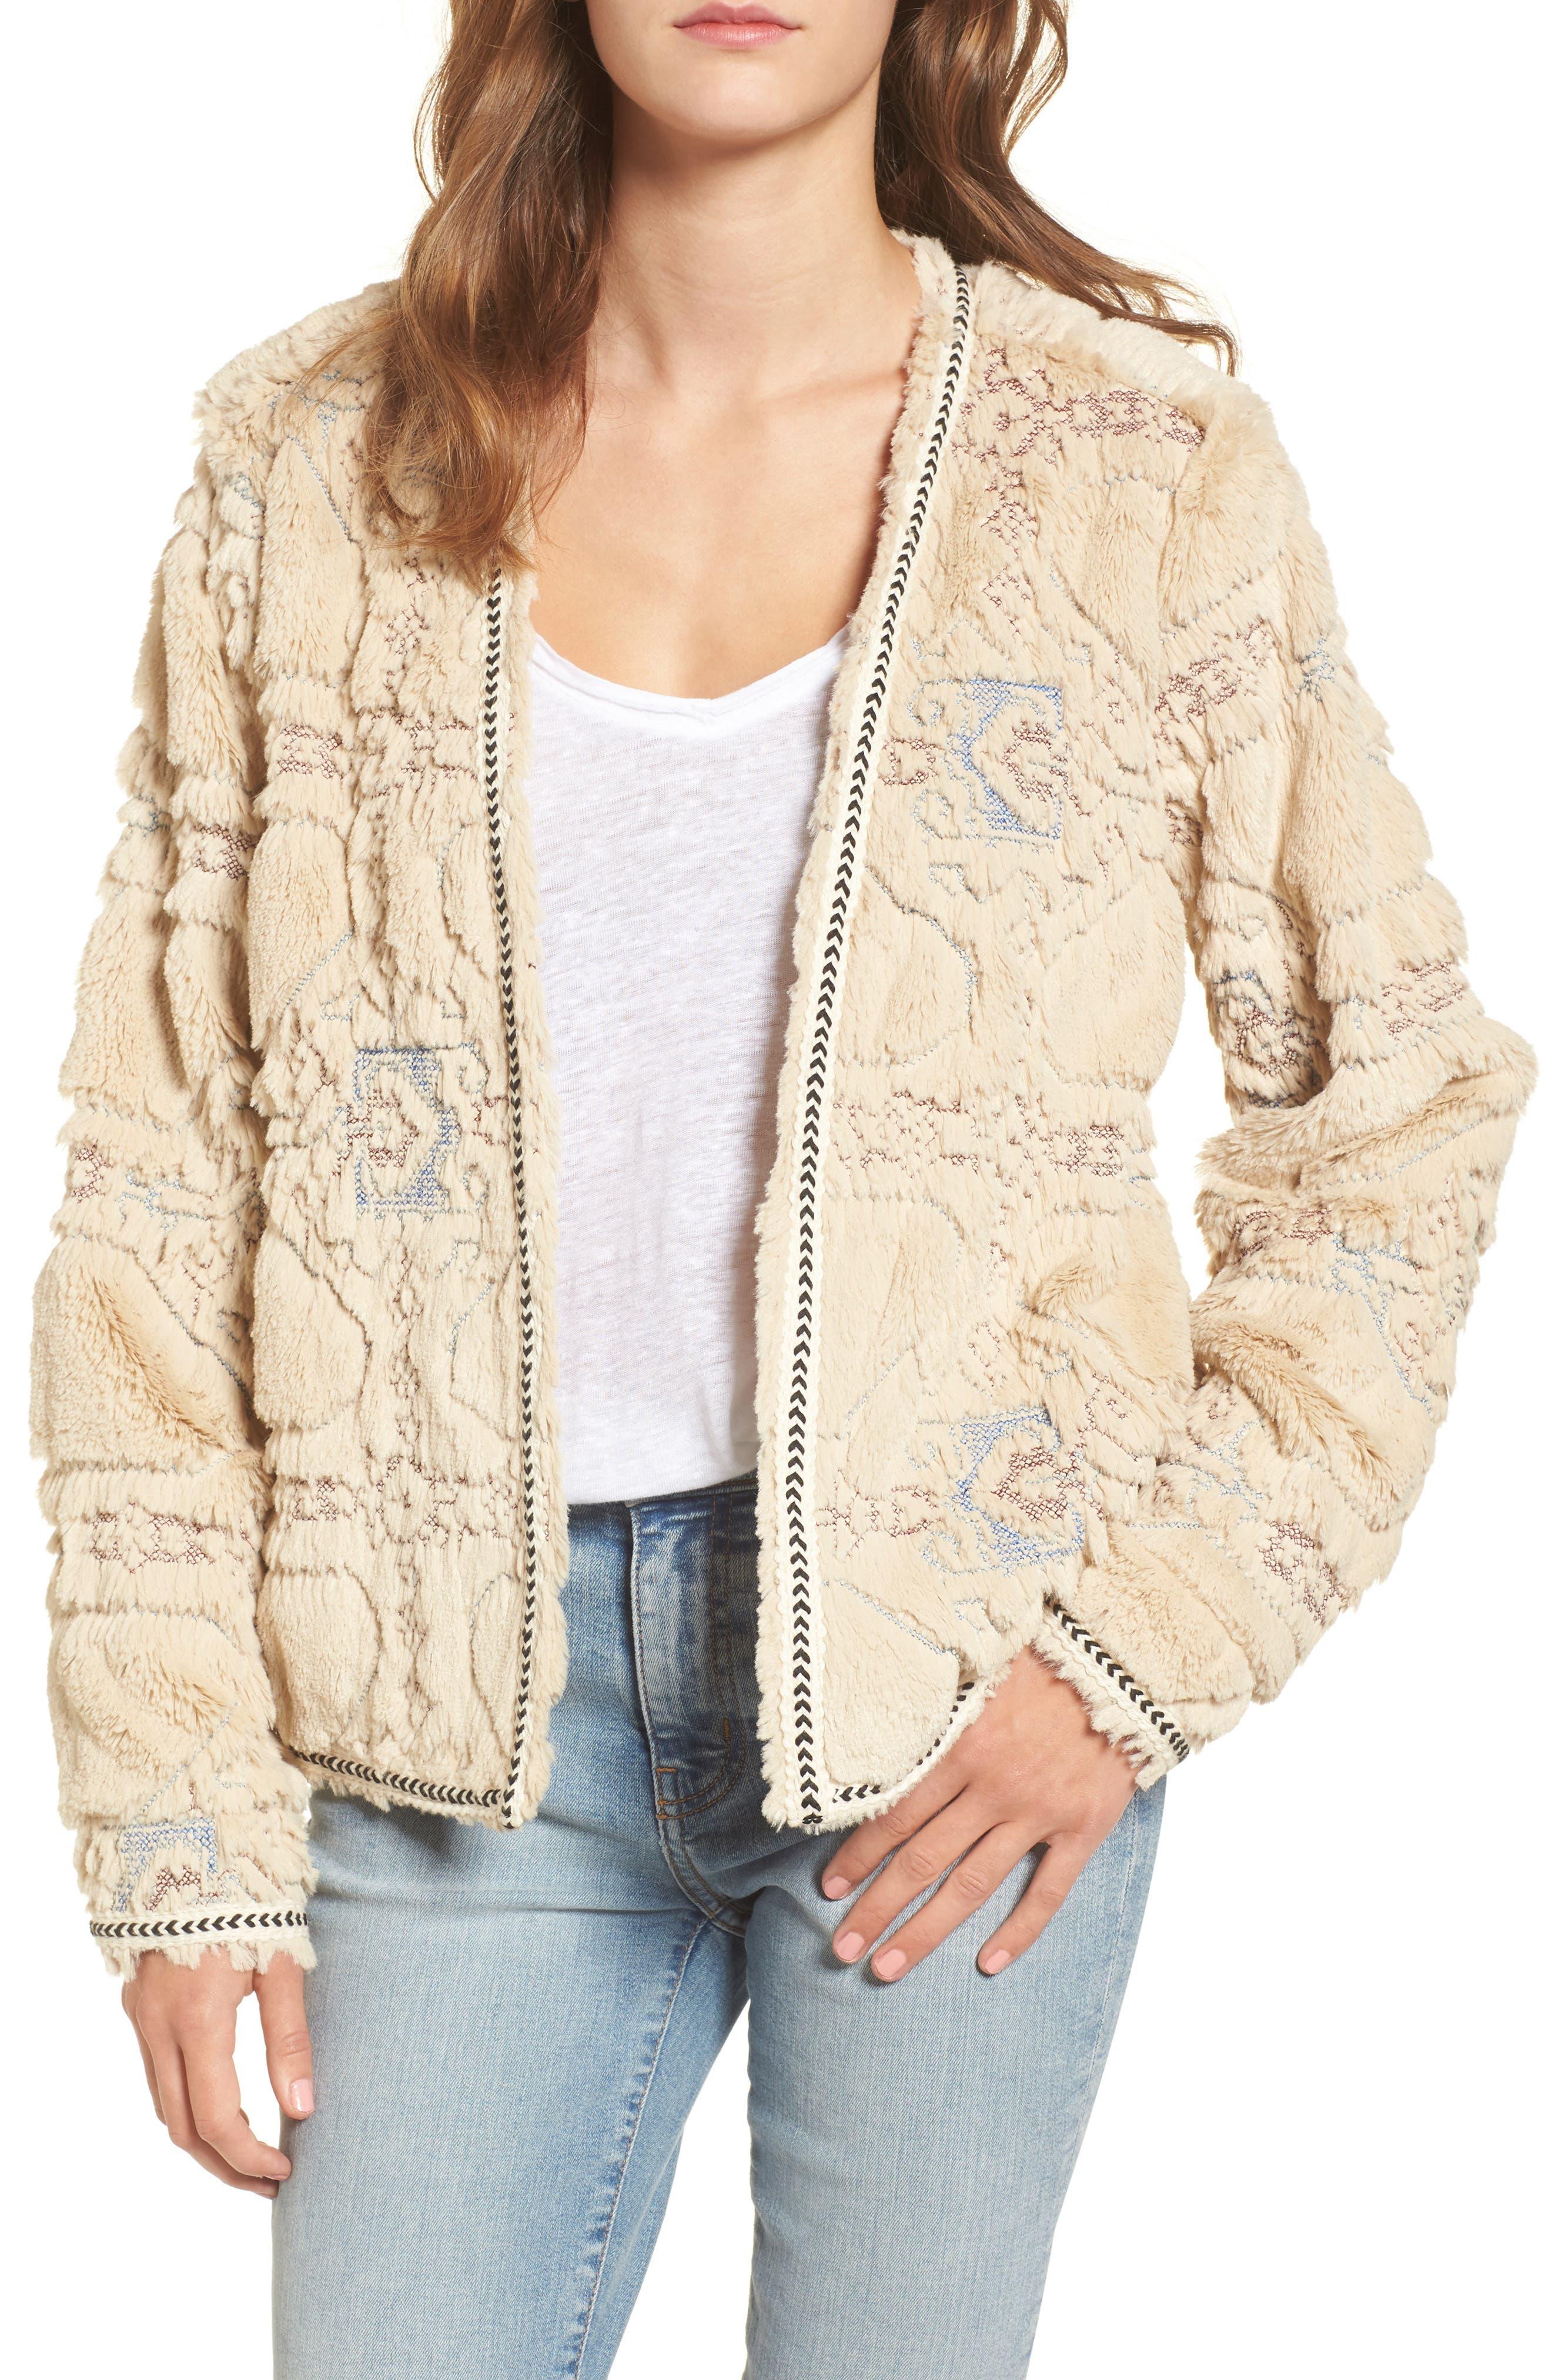 BNCI Embossed Faux Fur Cardigan,                         Main,                         color, Cream